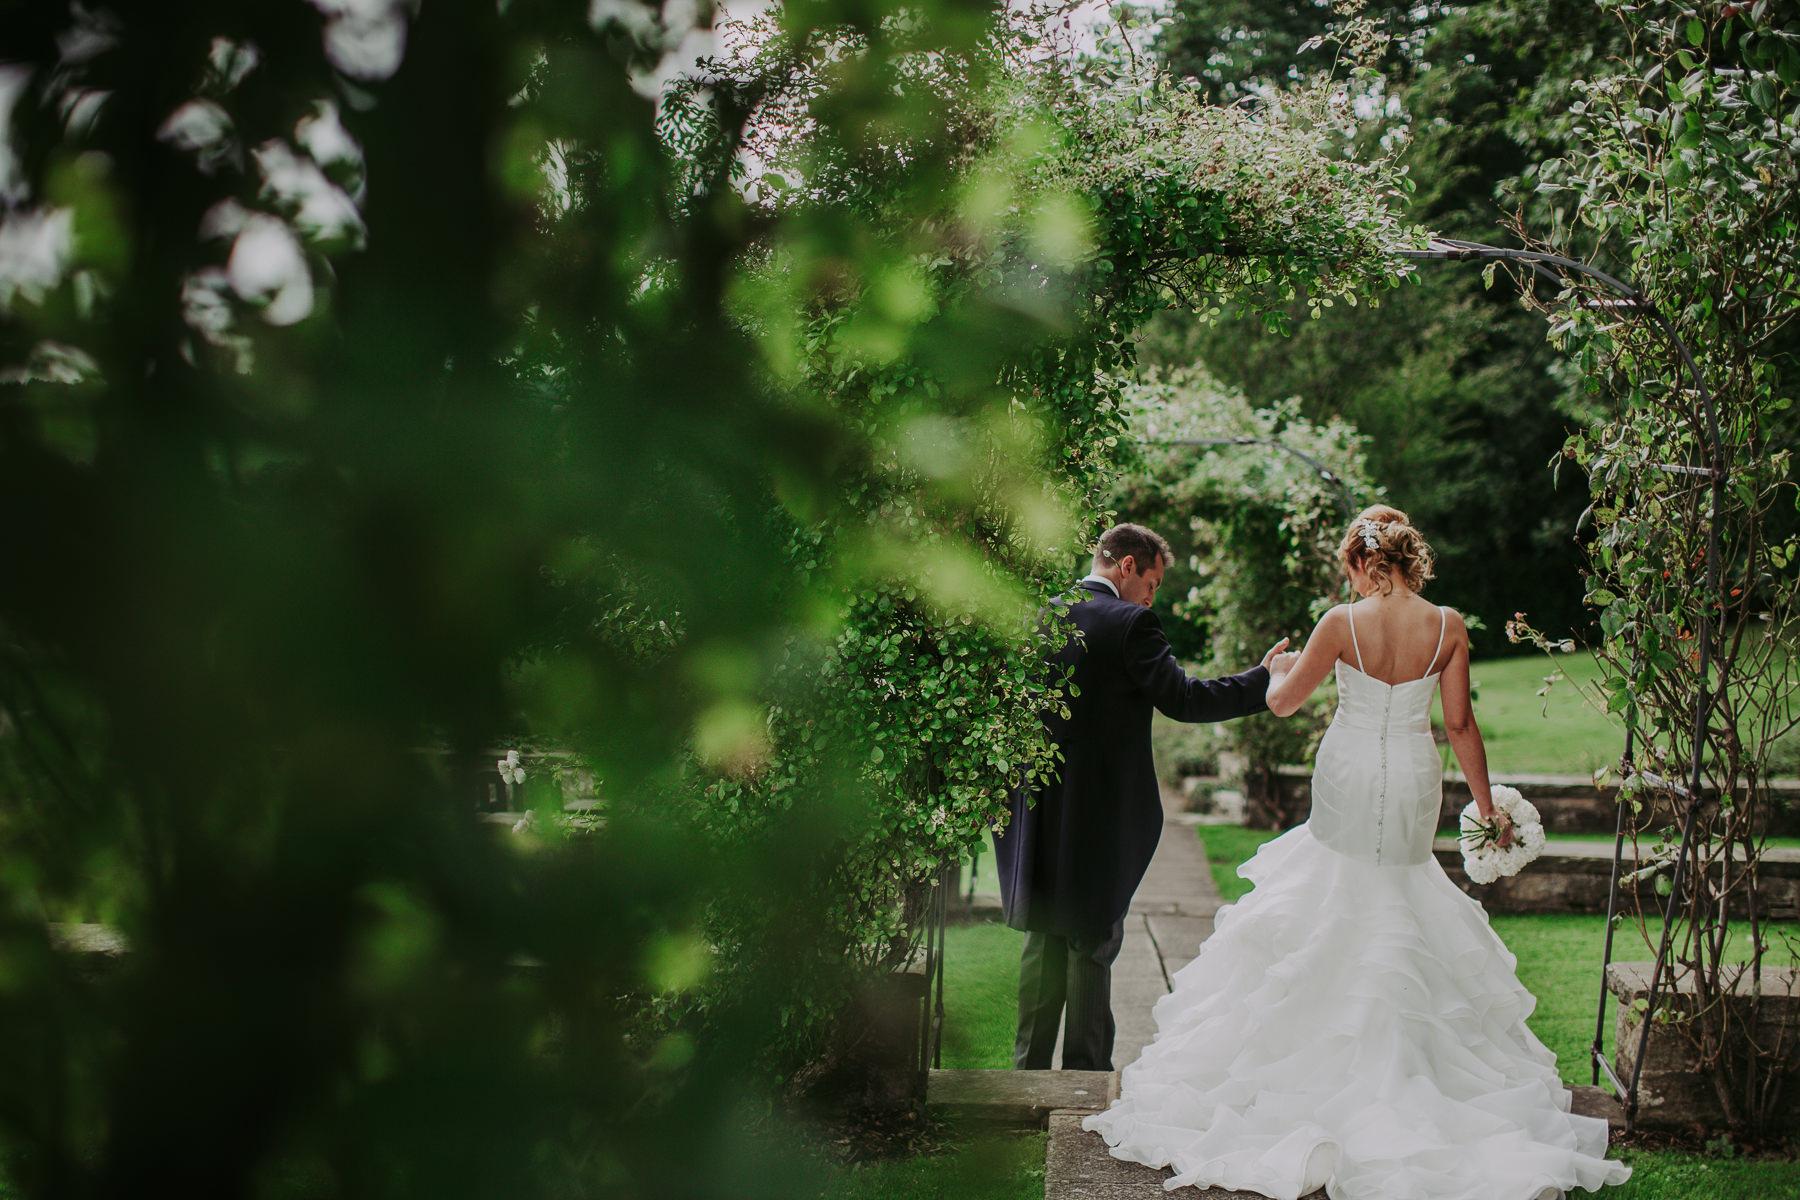 Meg & Jon | Wood Hall Hotel Wedding 350